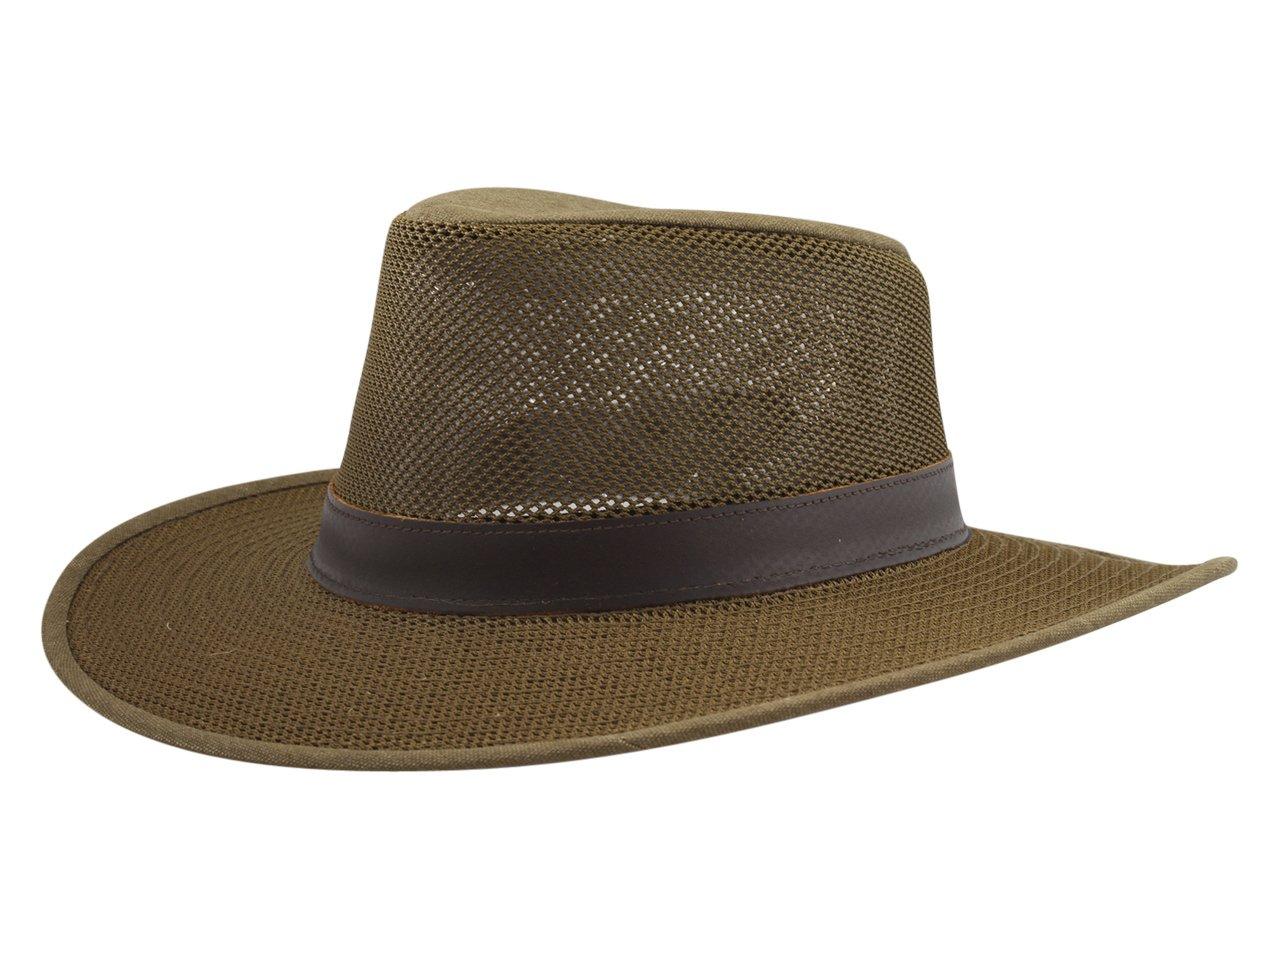 Henschel Adventurer Mesh Breezer Hat with Leather Band, Earth, Medium